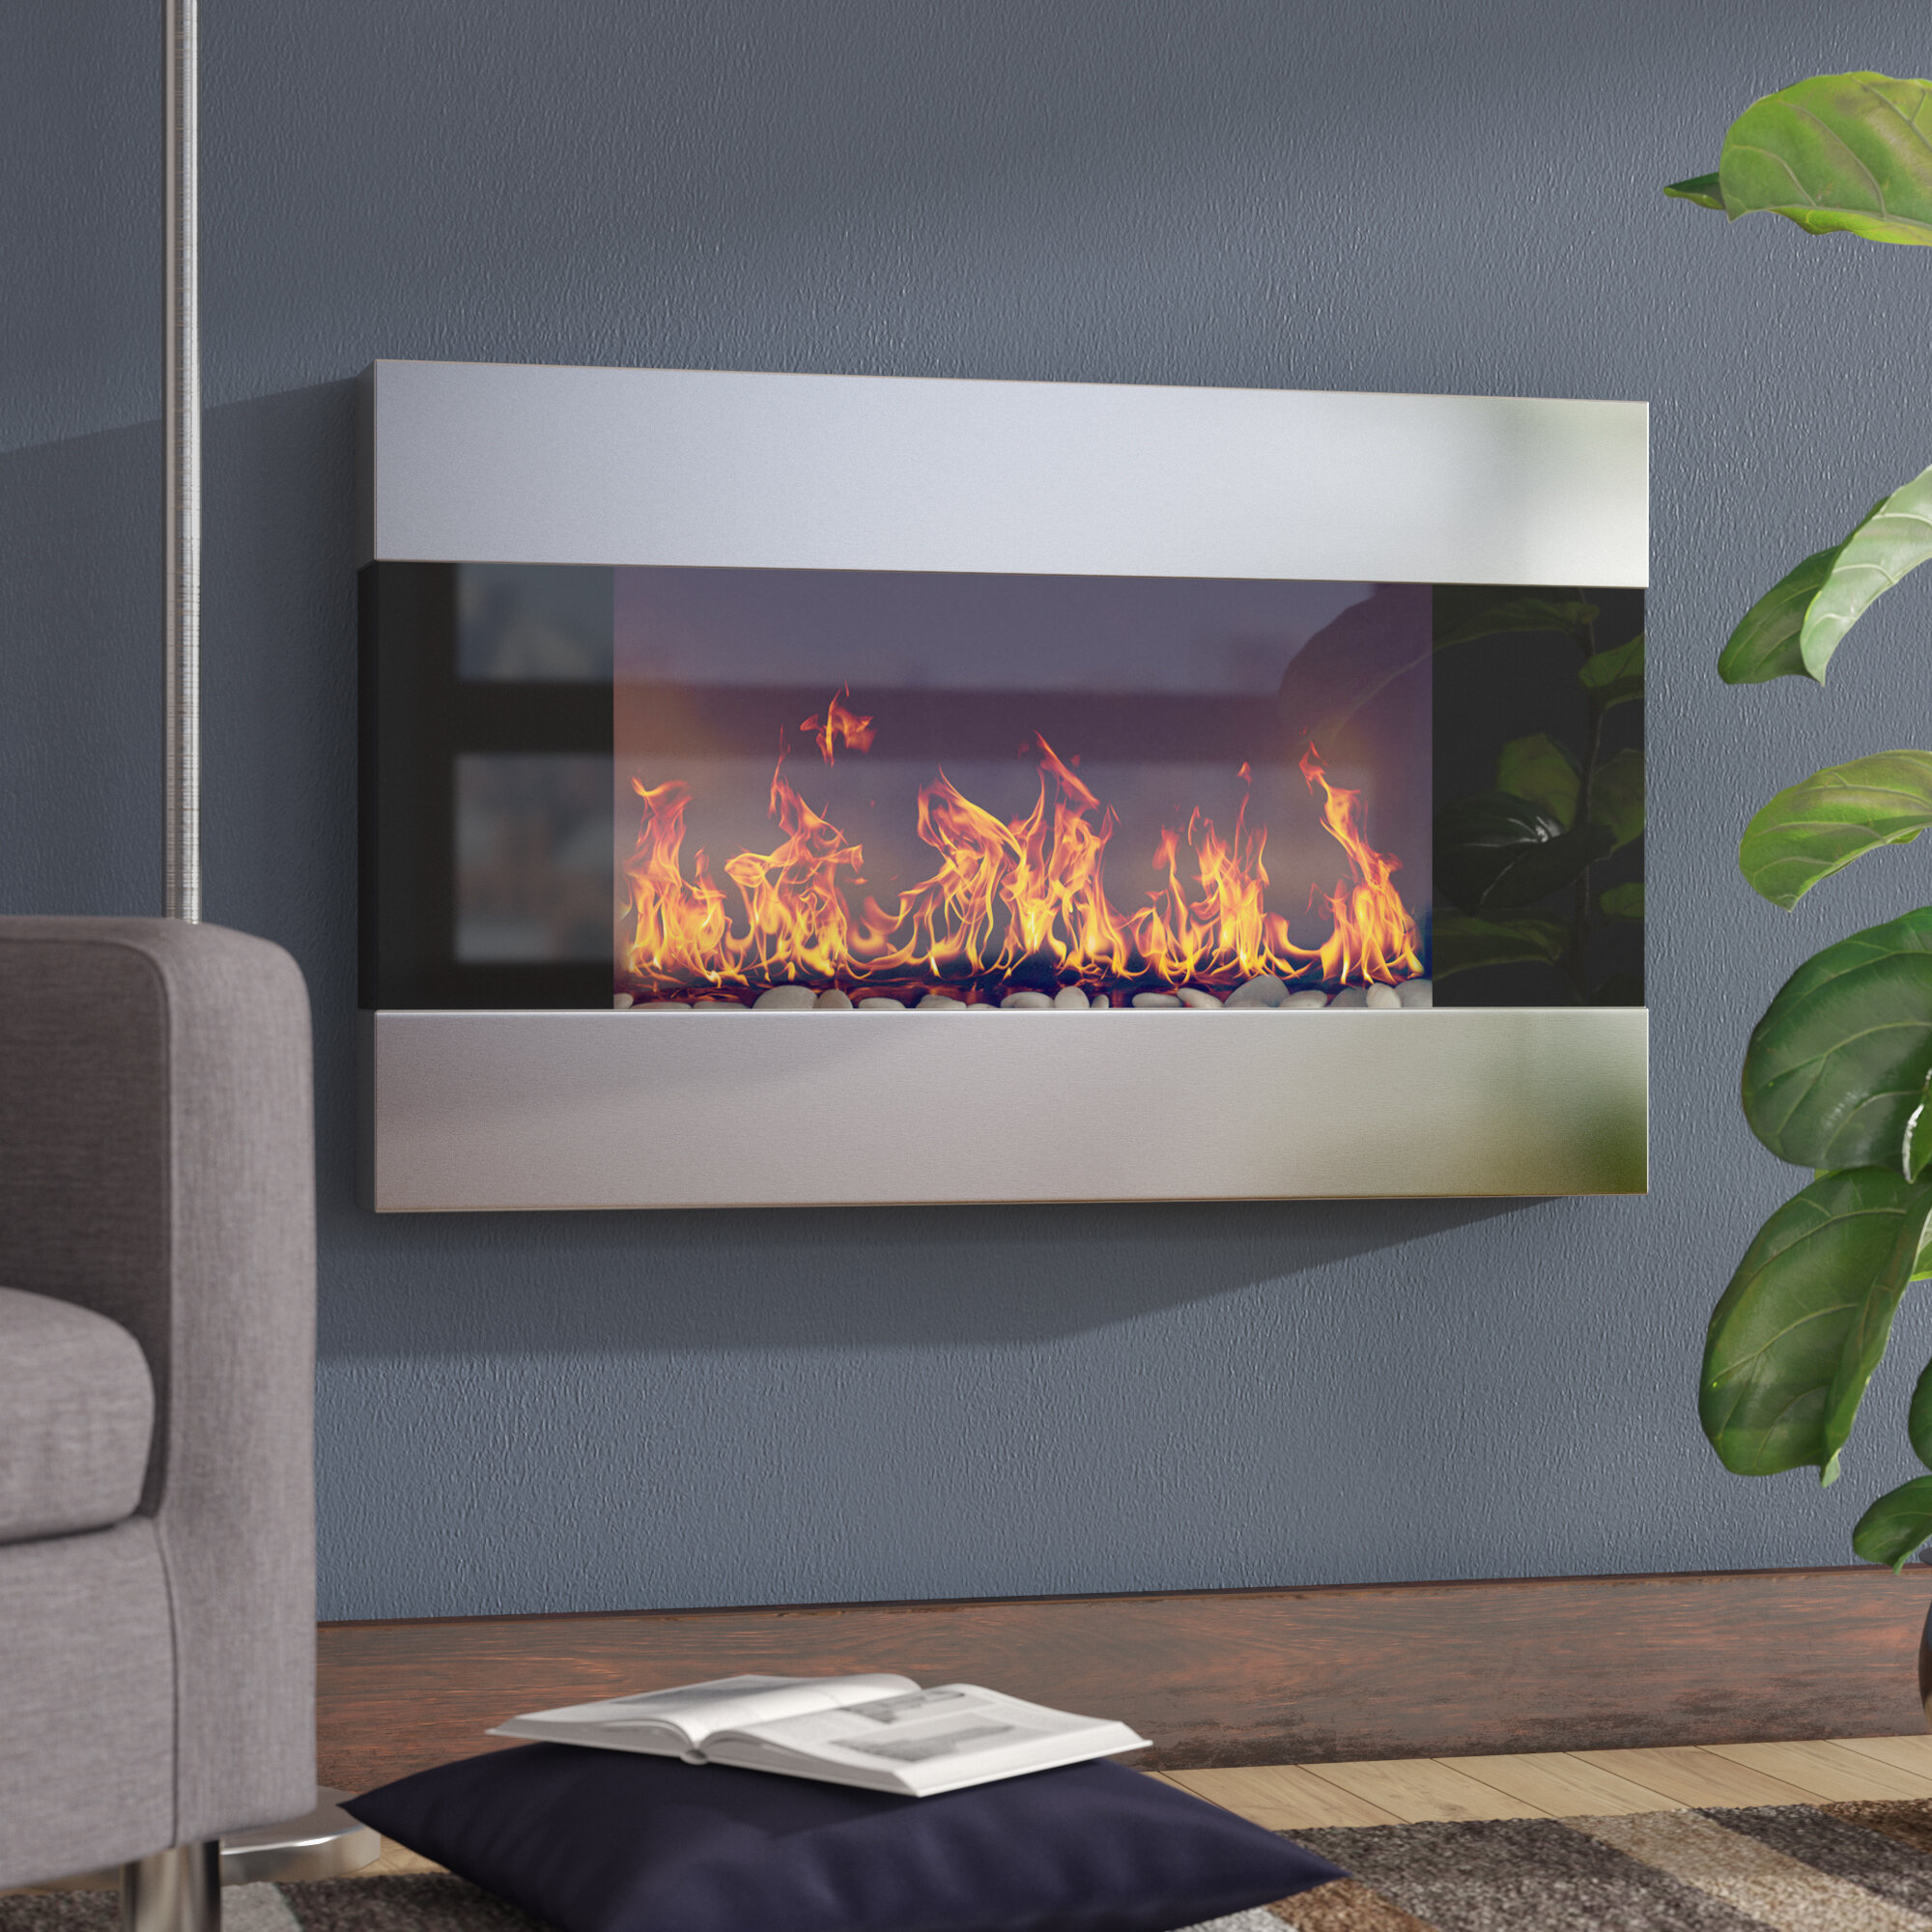 Strange Farmhouse Electric Fireplace Wayfair Interior Design Ideas Gentotryabchikinfo